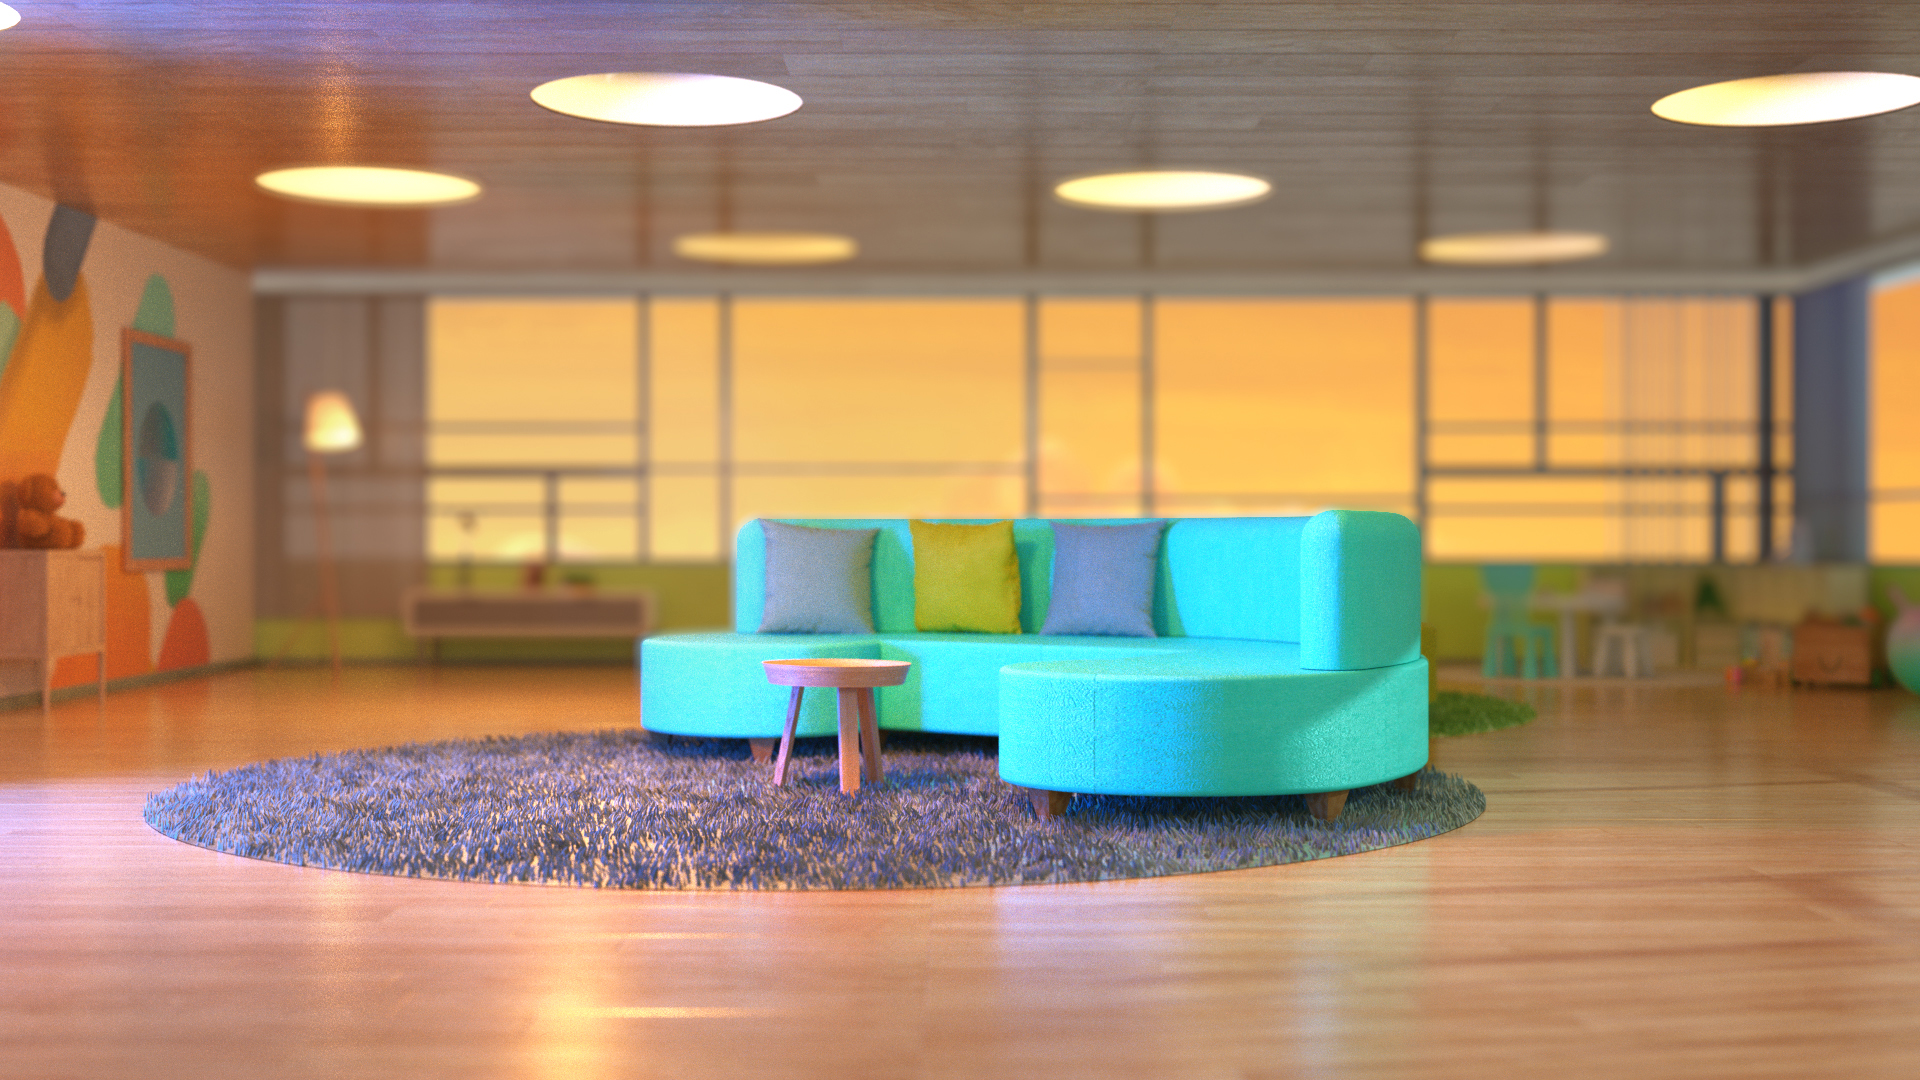 SH15_Waiting Room_02.jpg